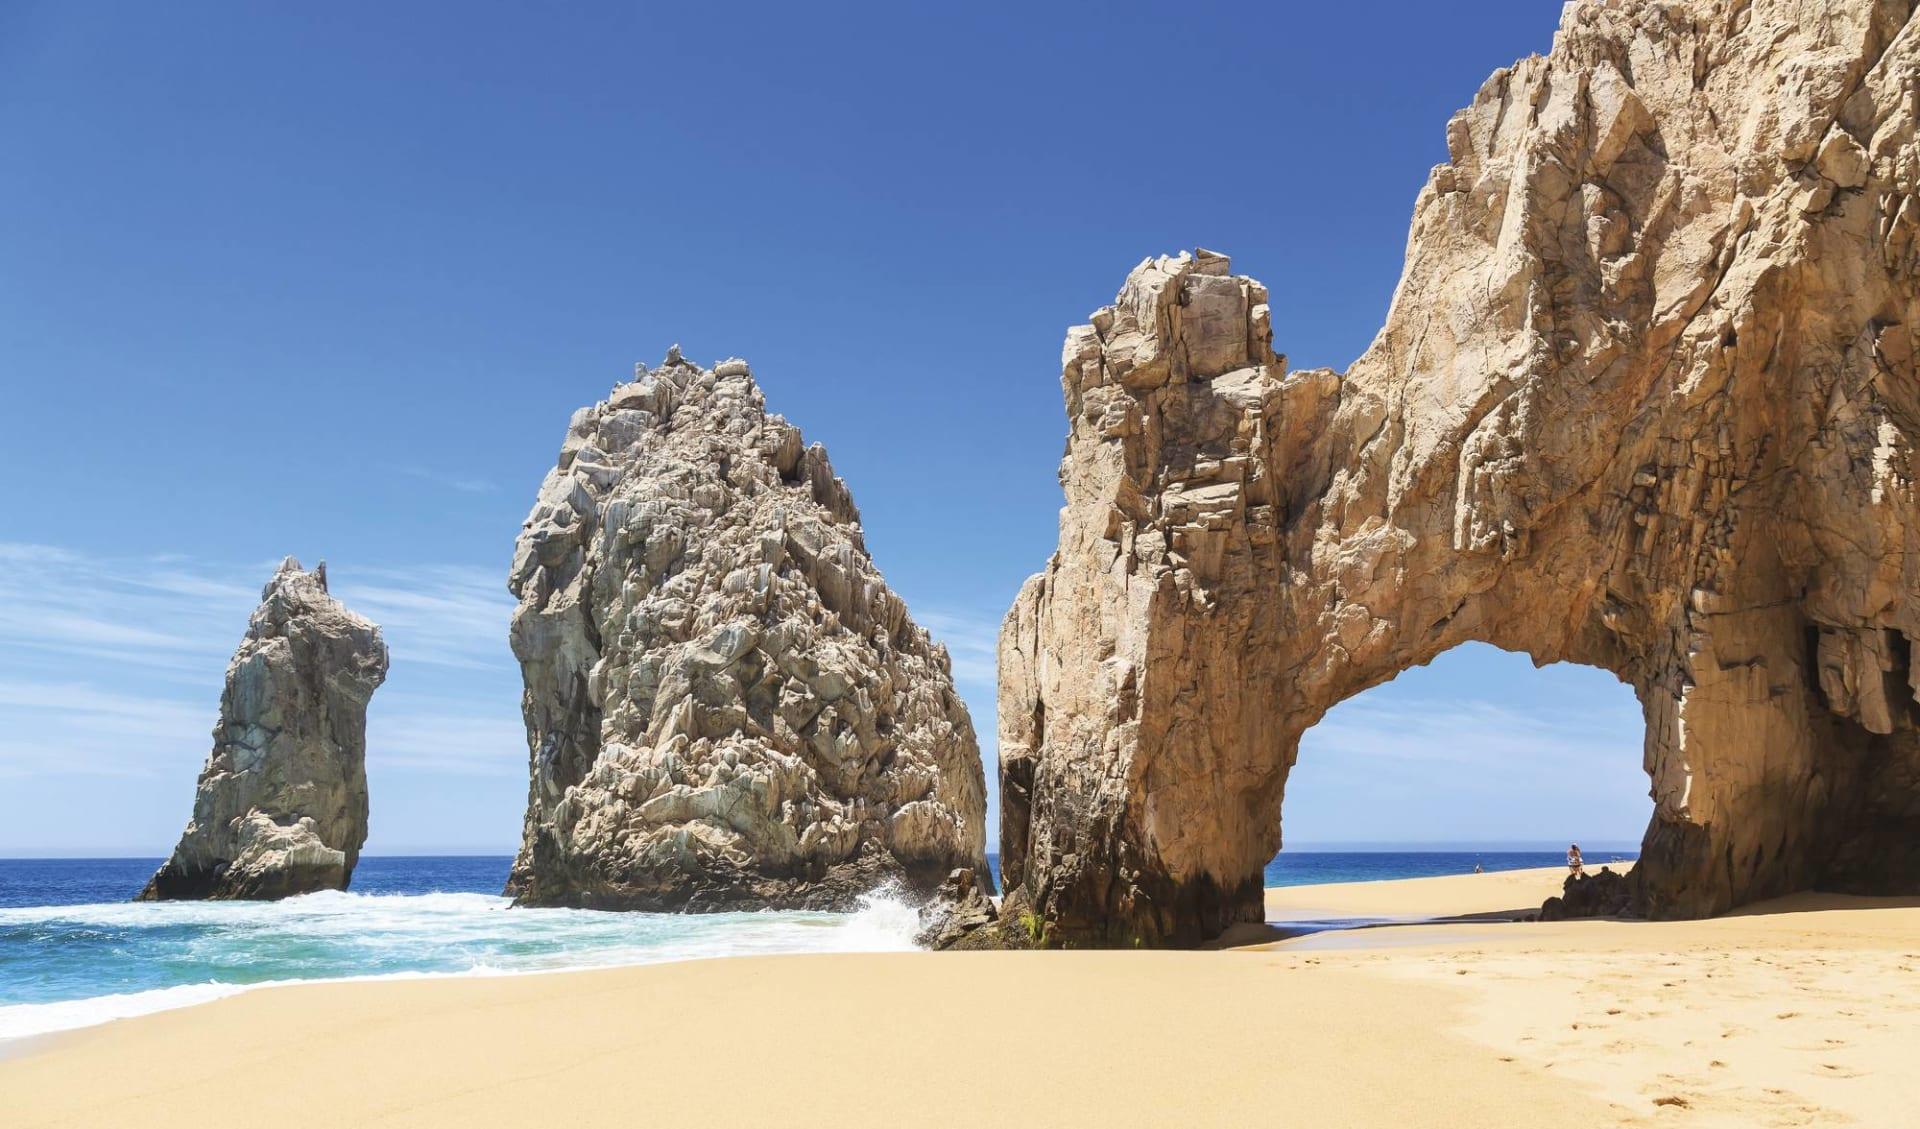 Höhepunkte Baja California ab La Paz: Mexico - Baja Calirfornia - Cabo San Lucas Los Arcos